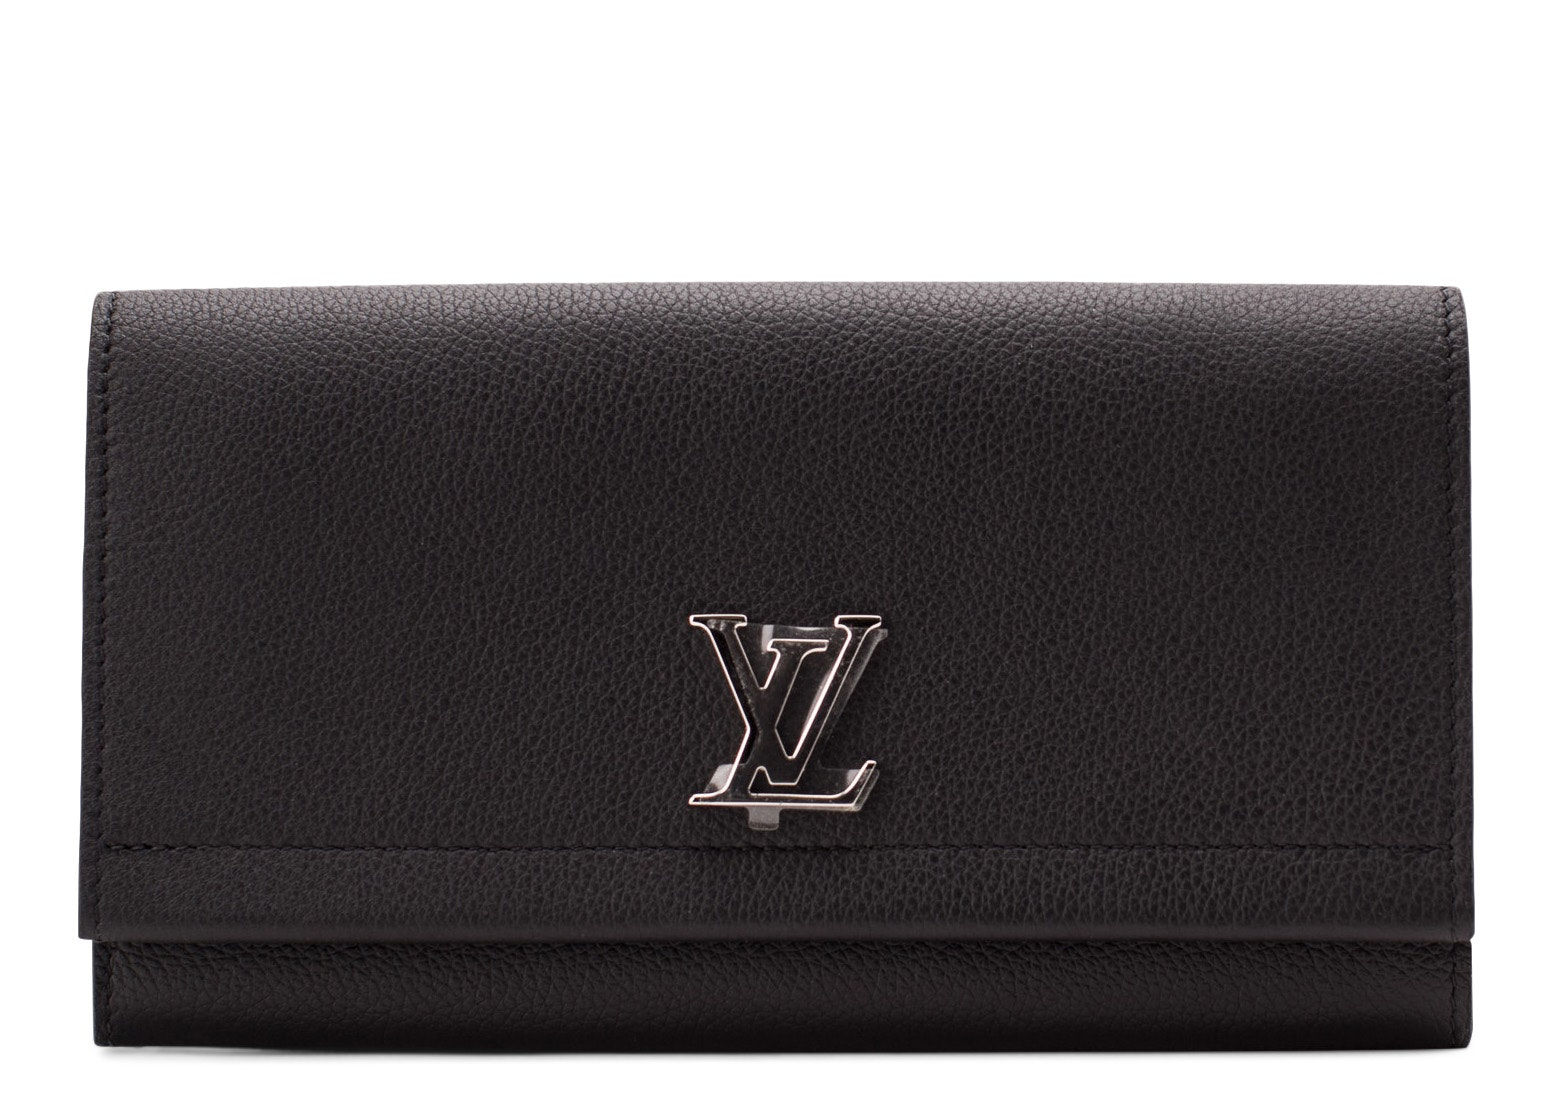 Louis Vuitton Wallet Lockme II Noir Black